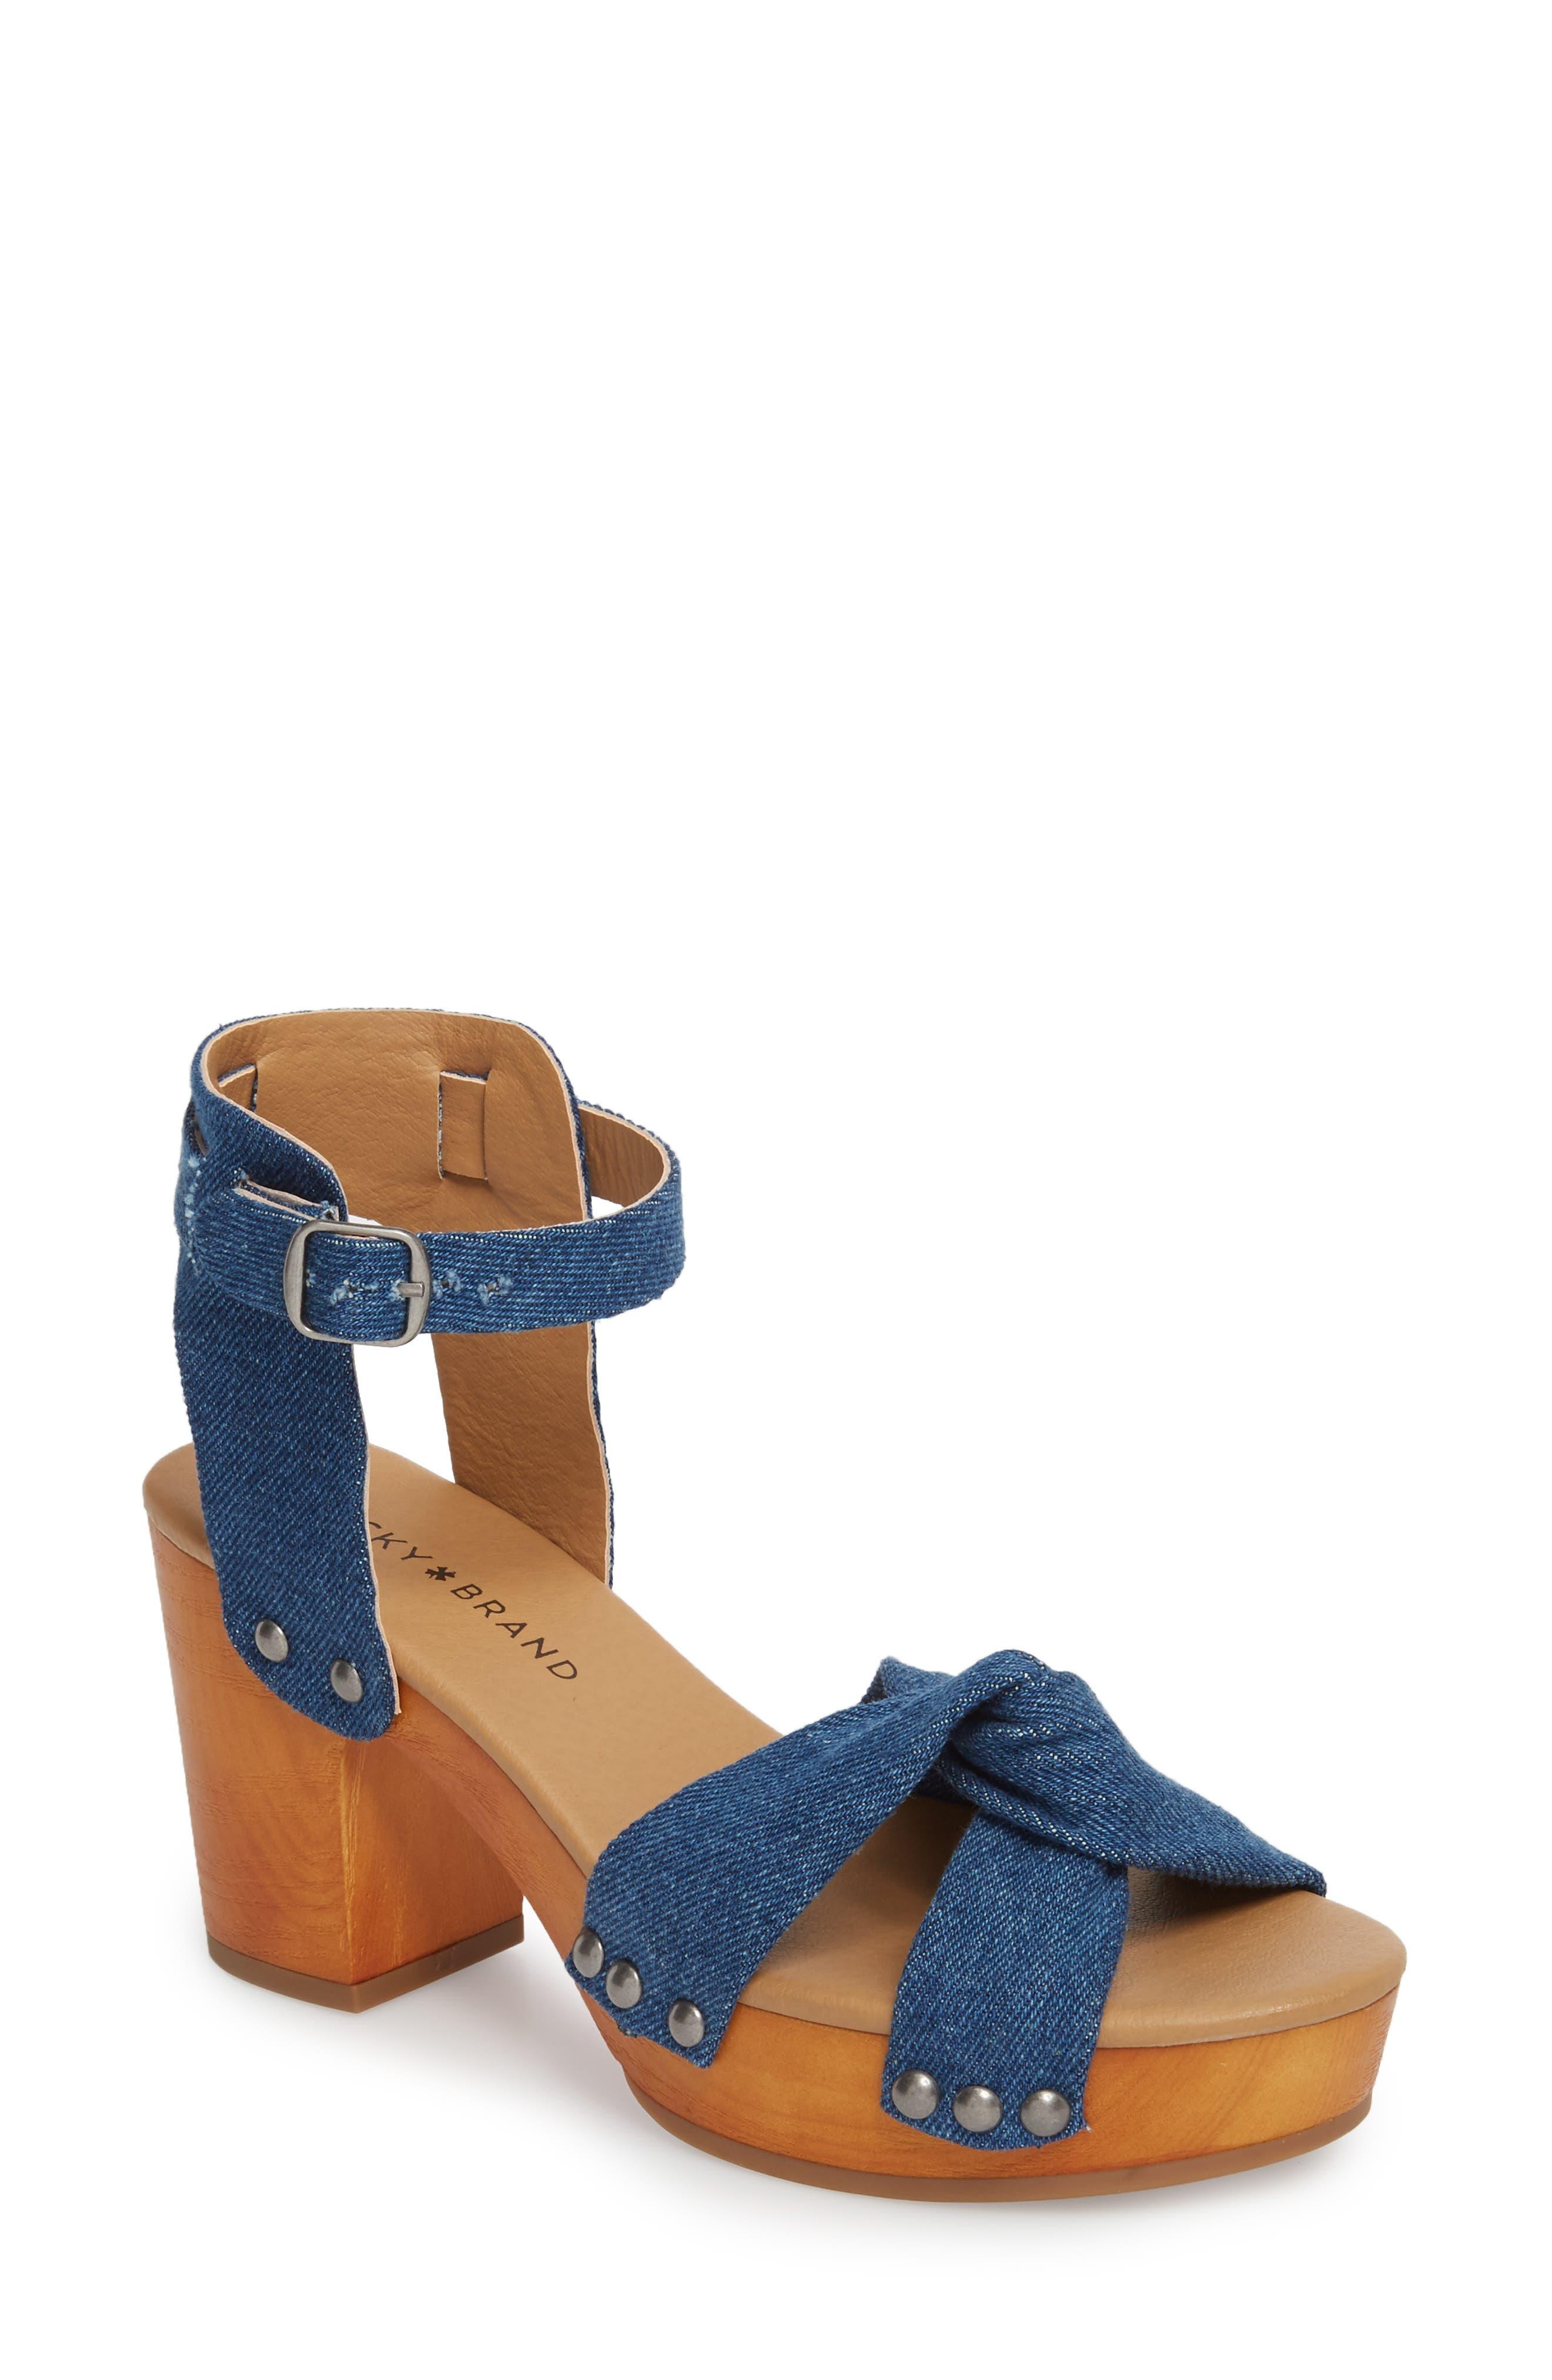 Main Image - Lucky Brand Whitneigh Sandal (Women)